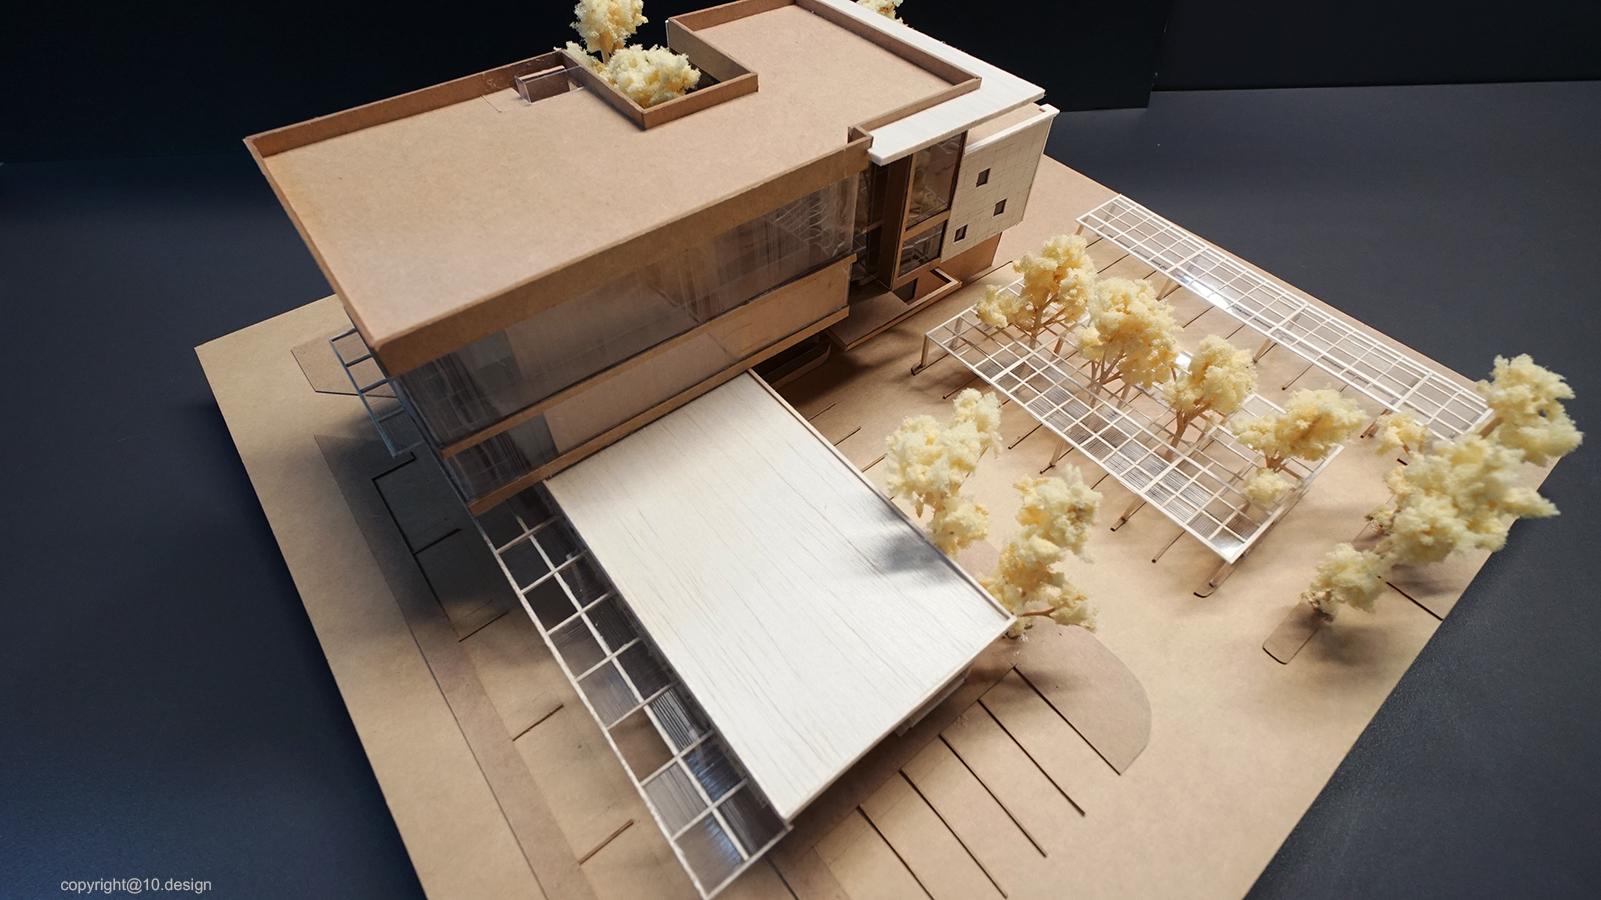 10 design space architecture landscape design bertram creative office 03